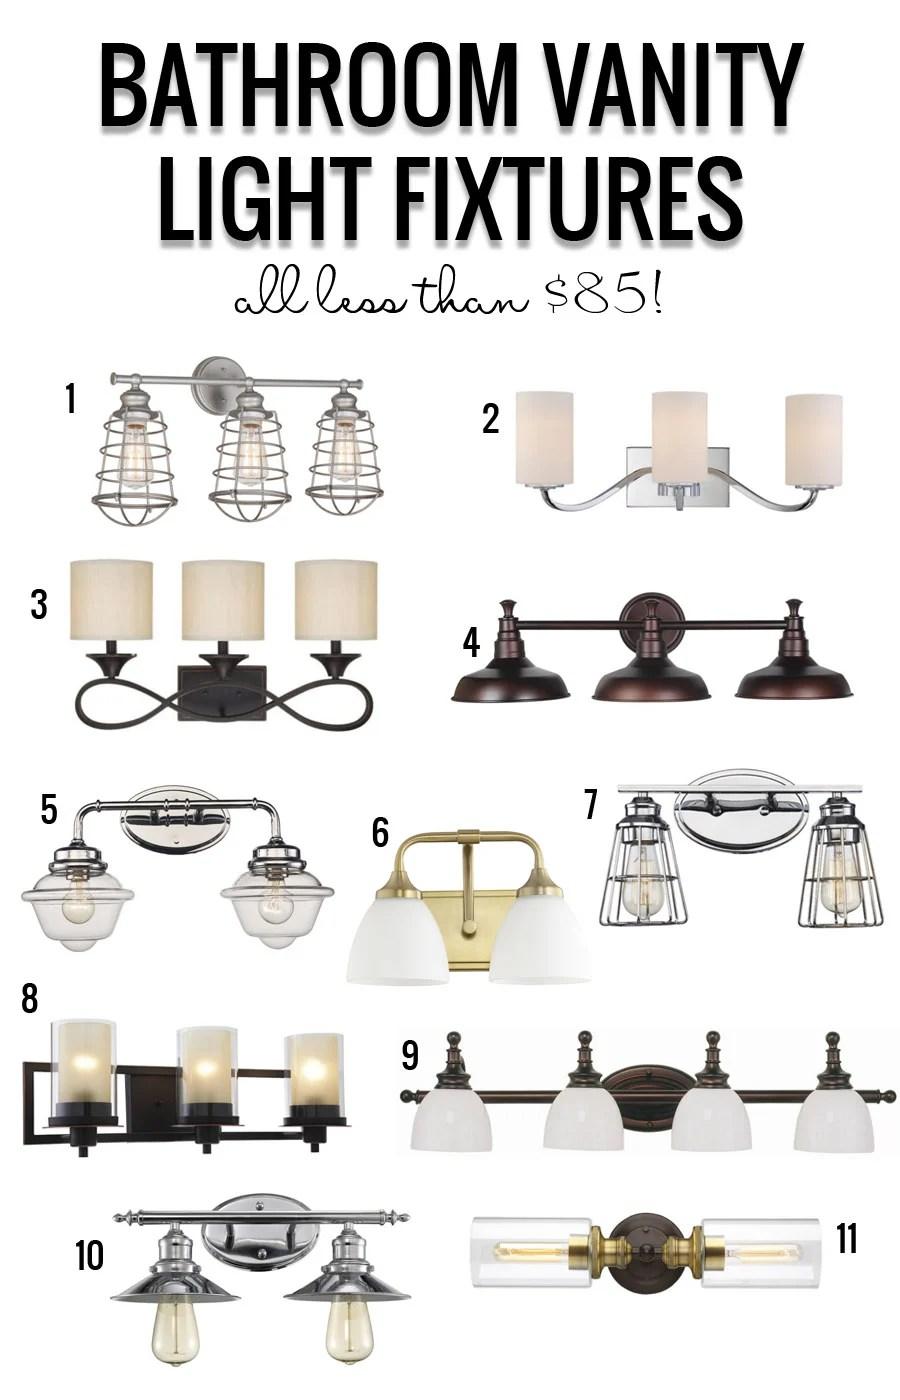 Bathroom Vanity Light Fixtures Under $85 featured on Remodelaholic.com